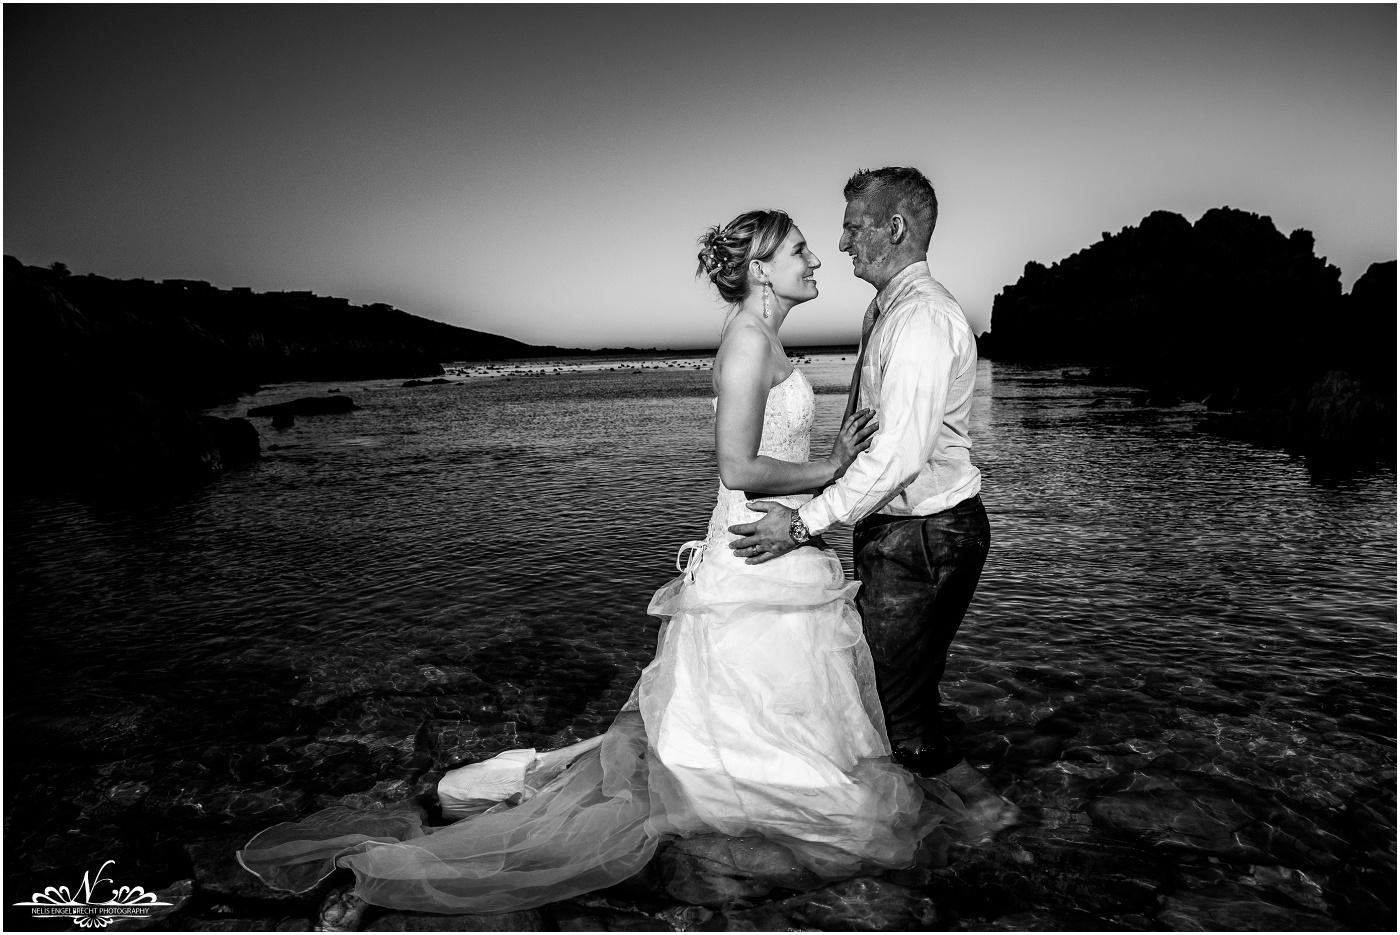 Nelis-Engelbrecht-Photography-100